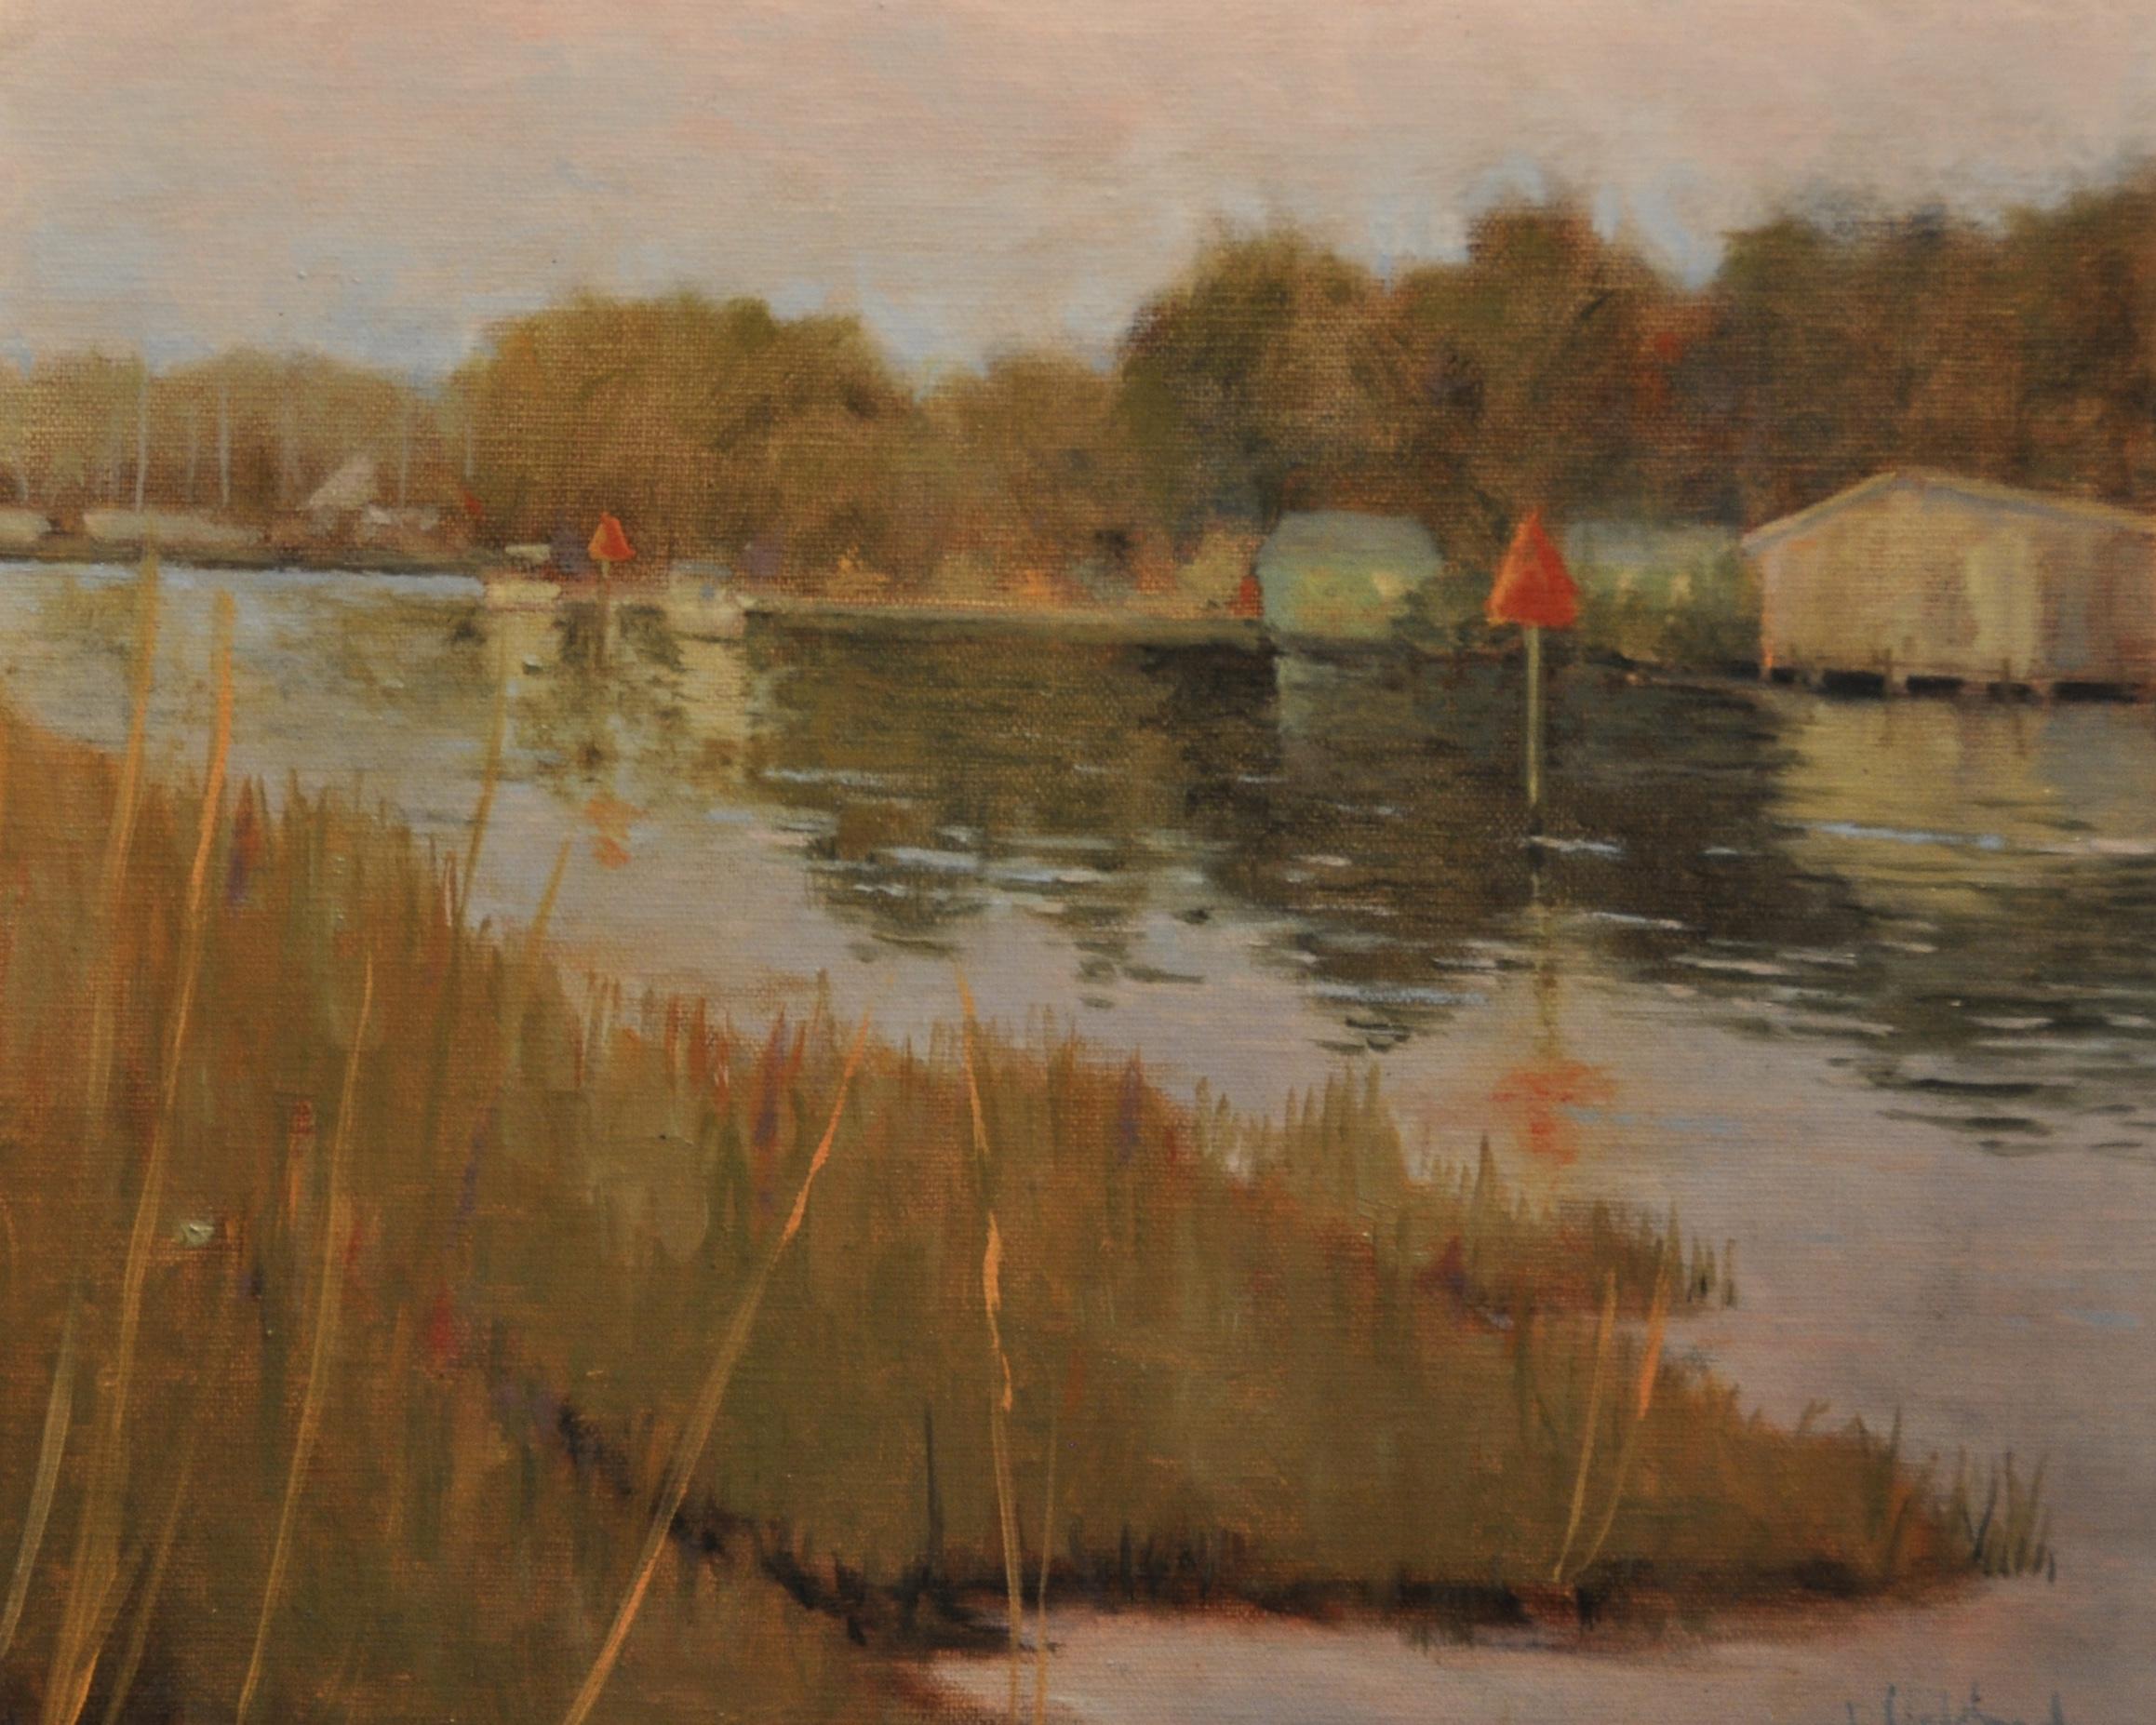 Dusk's Invitation, Oil on Linen, 8 x 10, sold